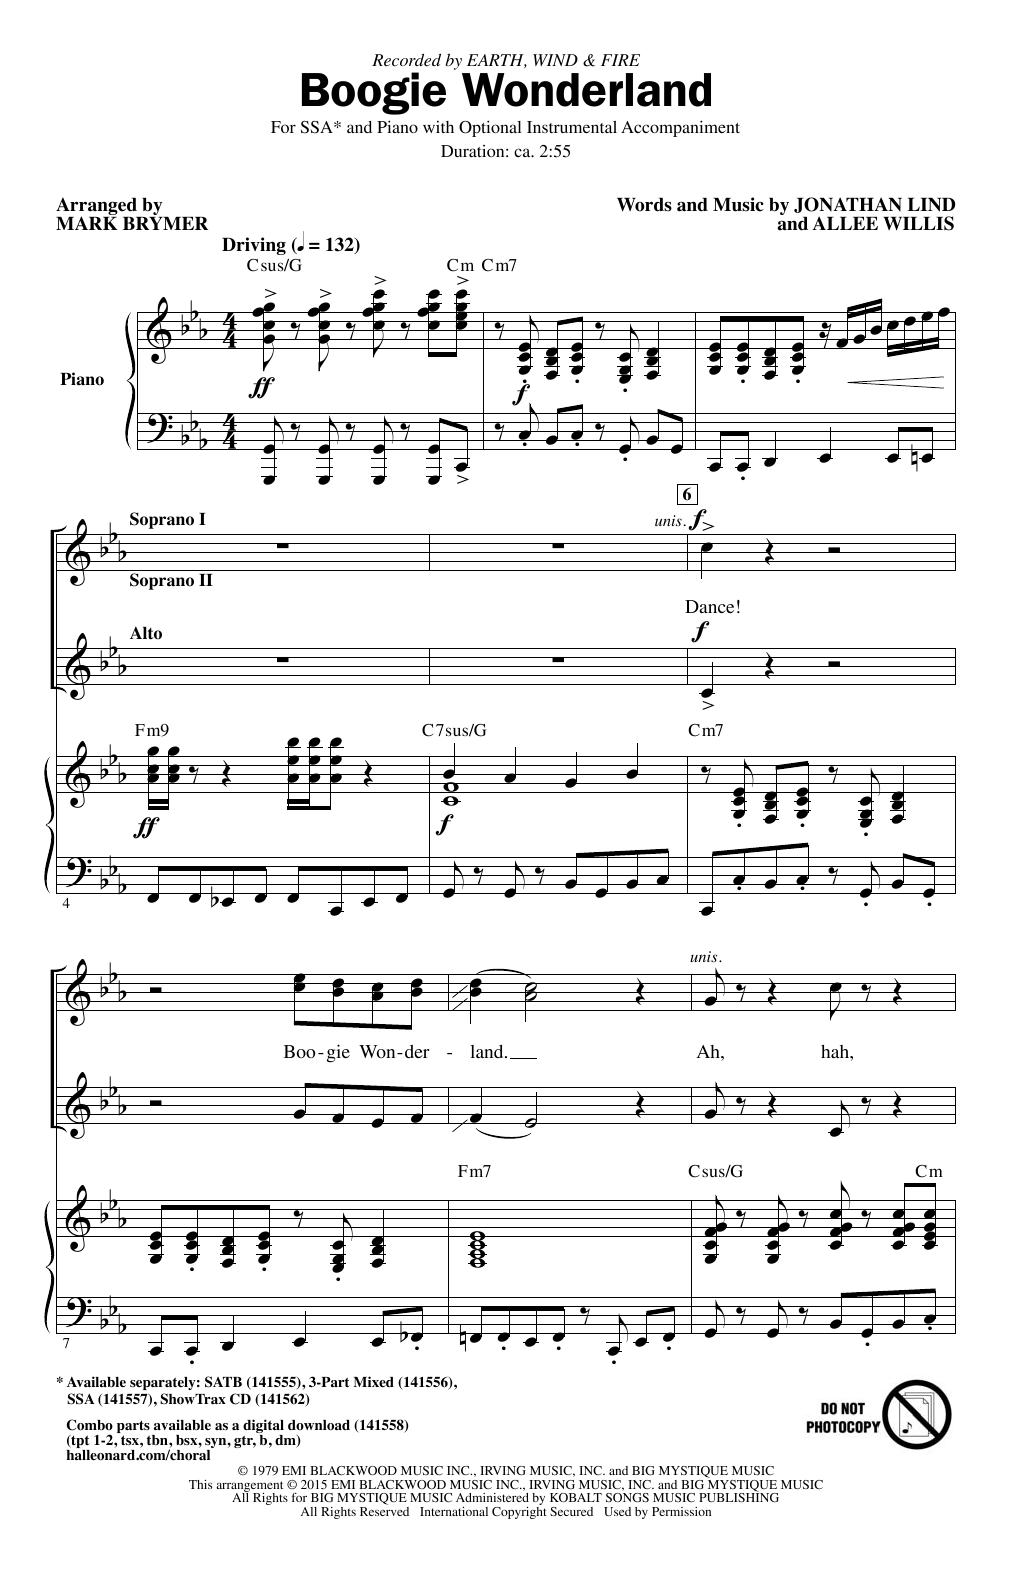 Partition chorale Boogie Wonderland (arr. Mark Brymer) de Wind & Fire Earth - SSA